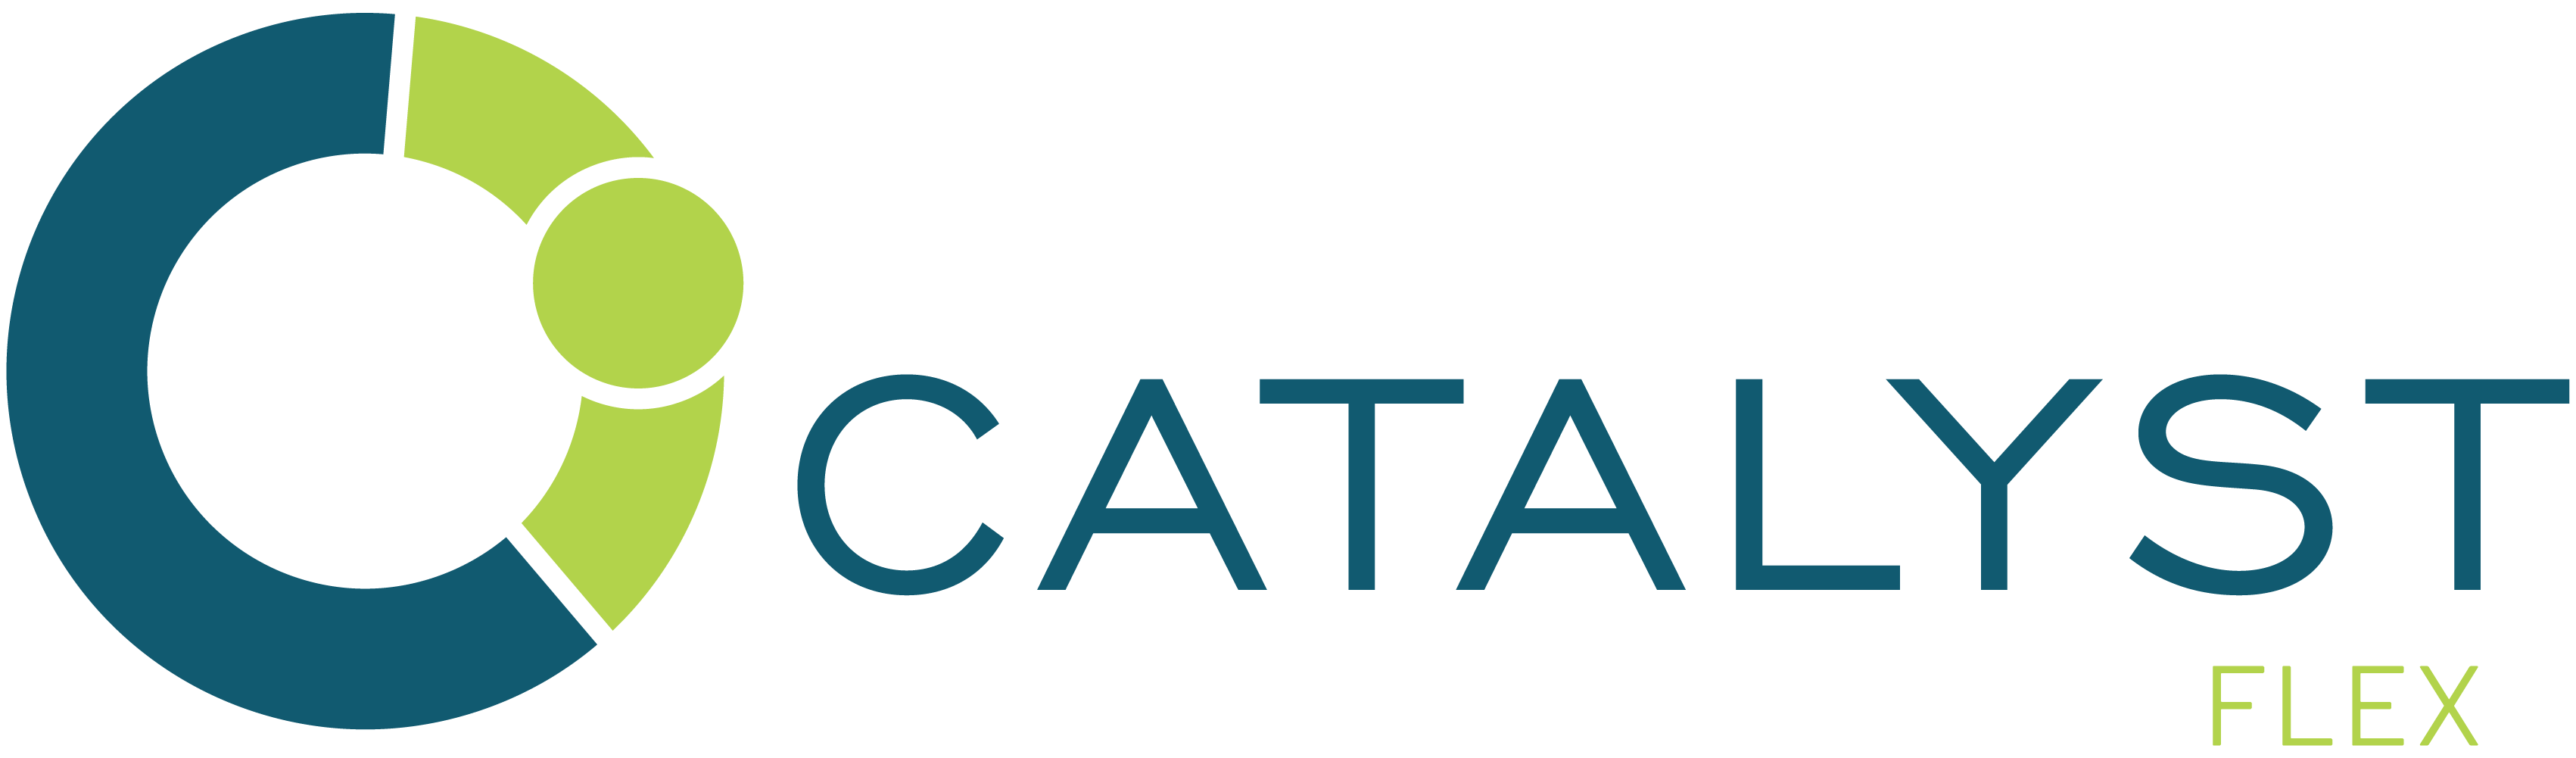 Catalyst_Flex_logo